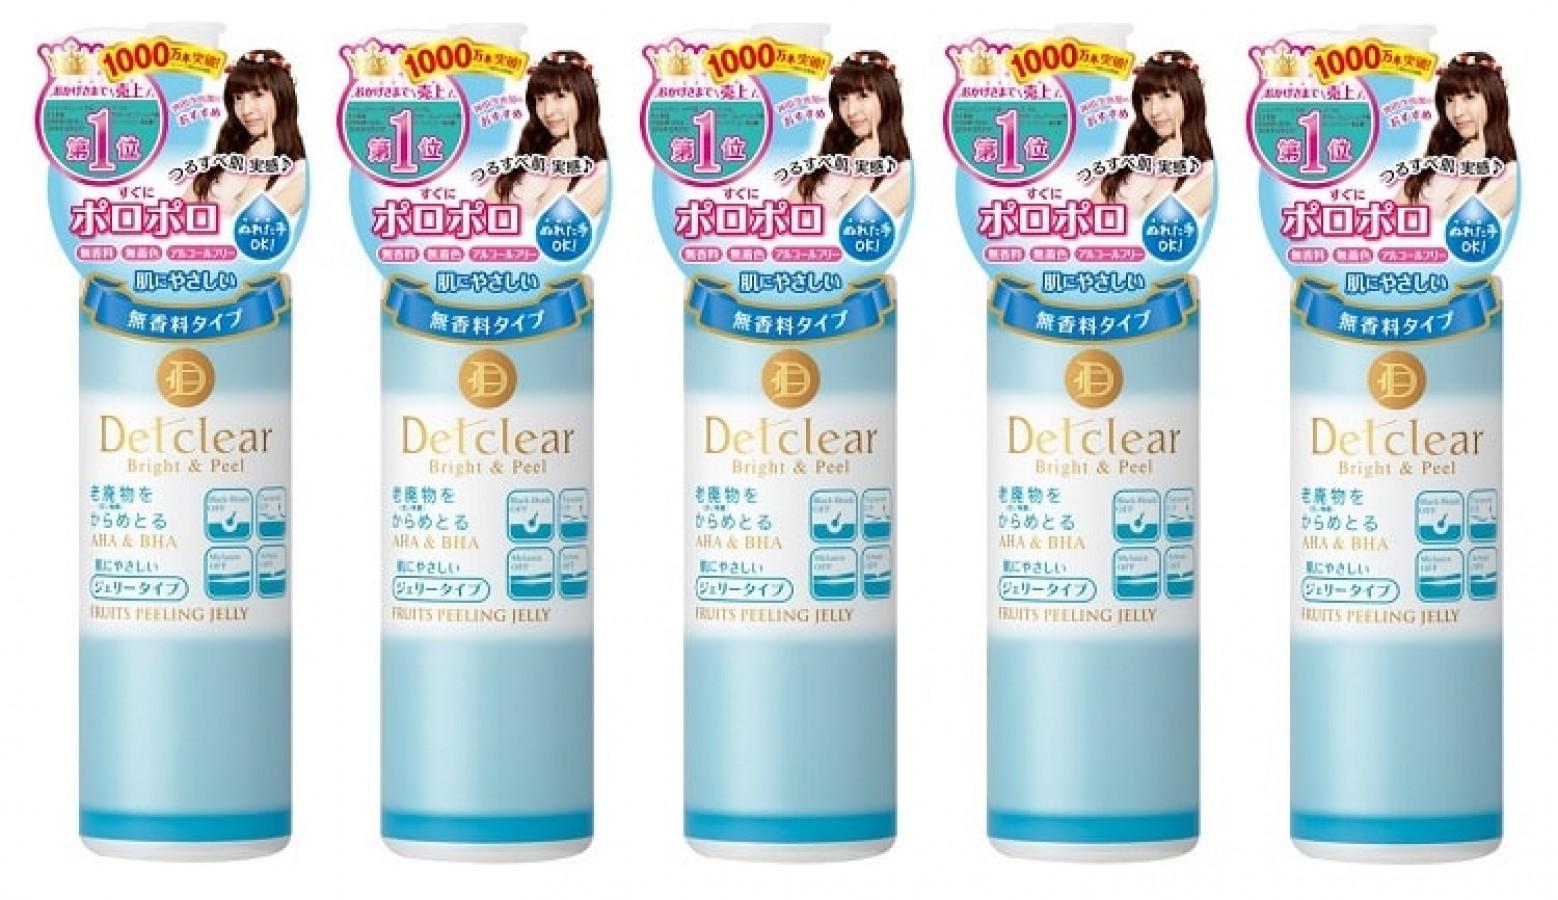 Tẩy Da Chết Detclear Bright & Peel